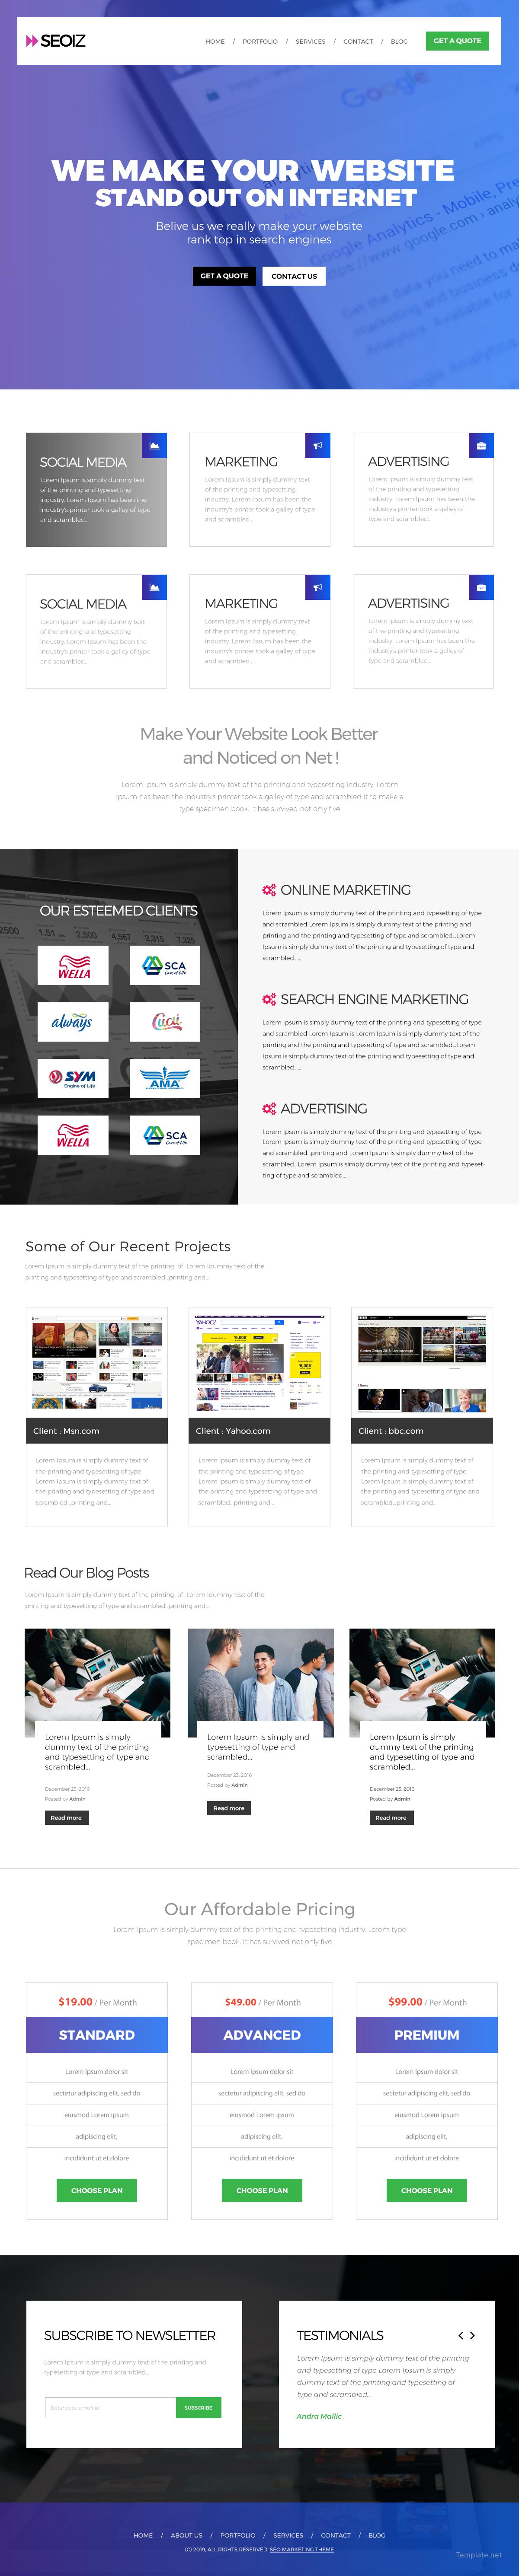 SEO Website Template in PSD | Template.net